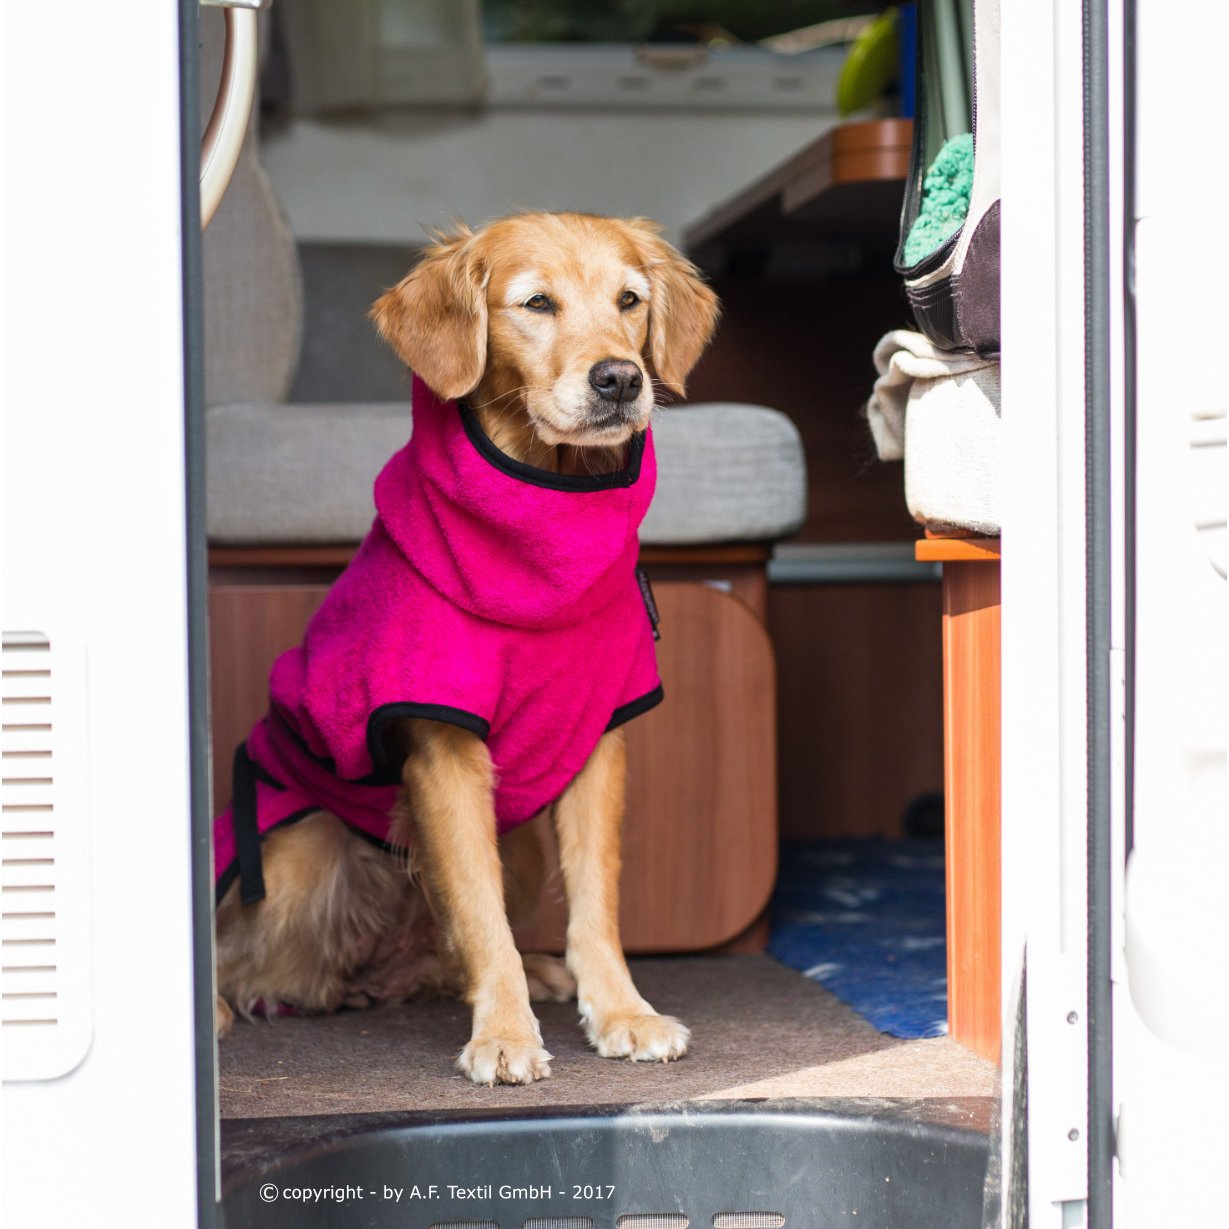 fit4dogs Trockenmantel Hund Dryup Cape, Bild 24